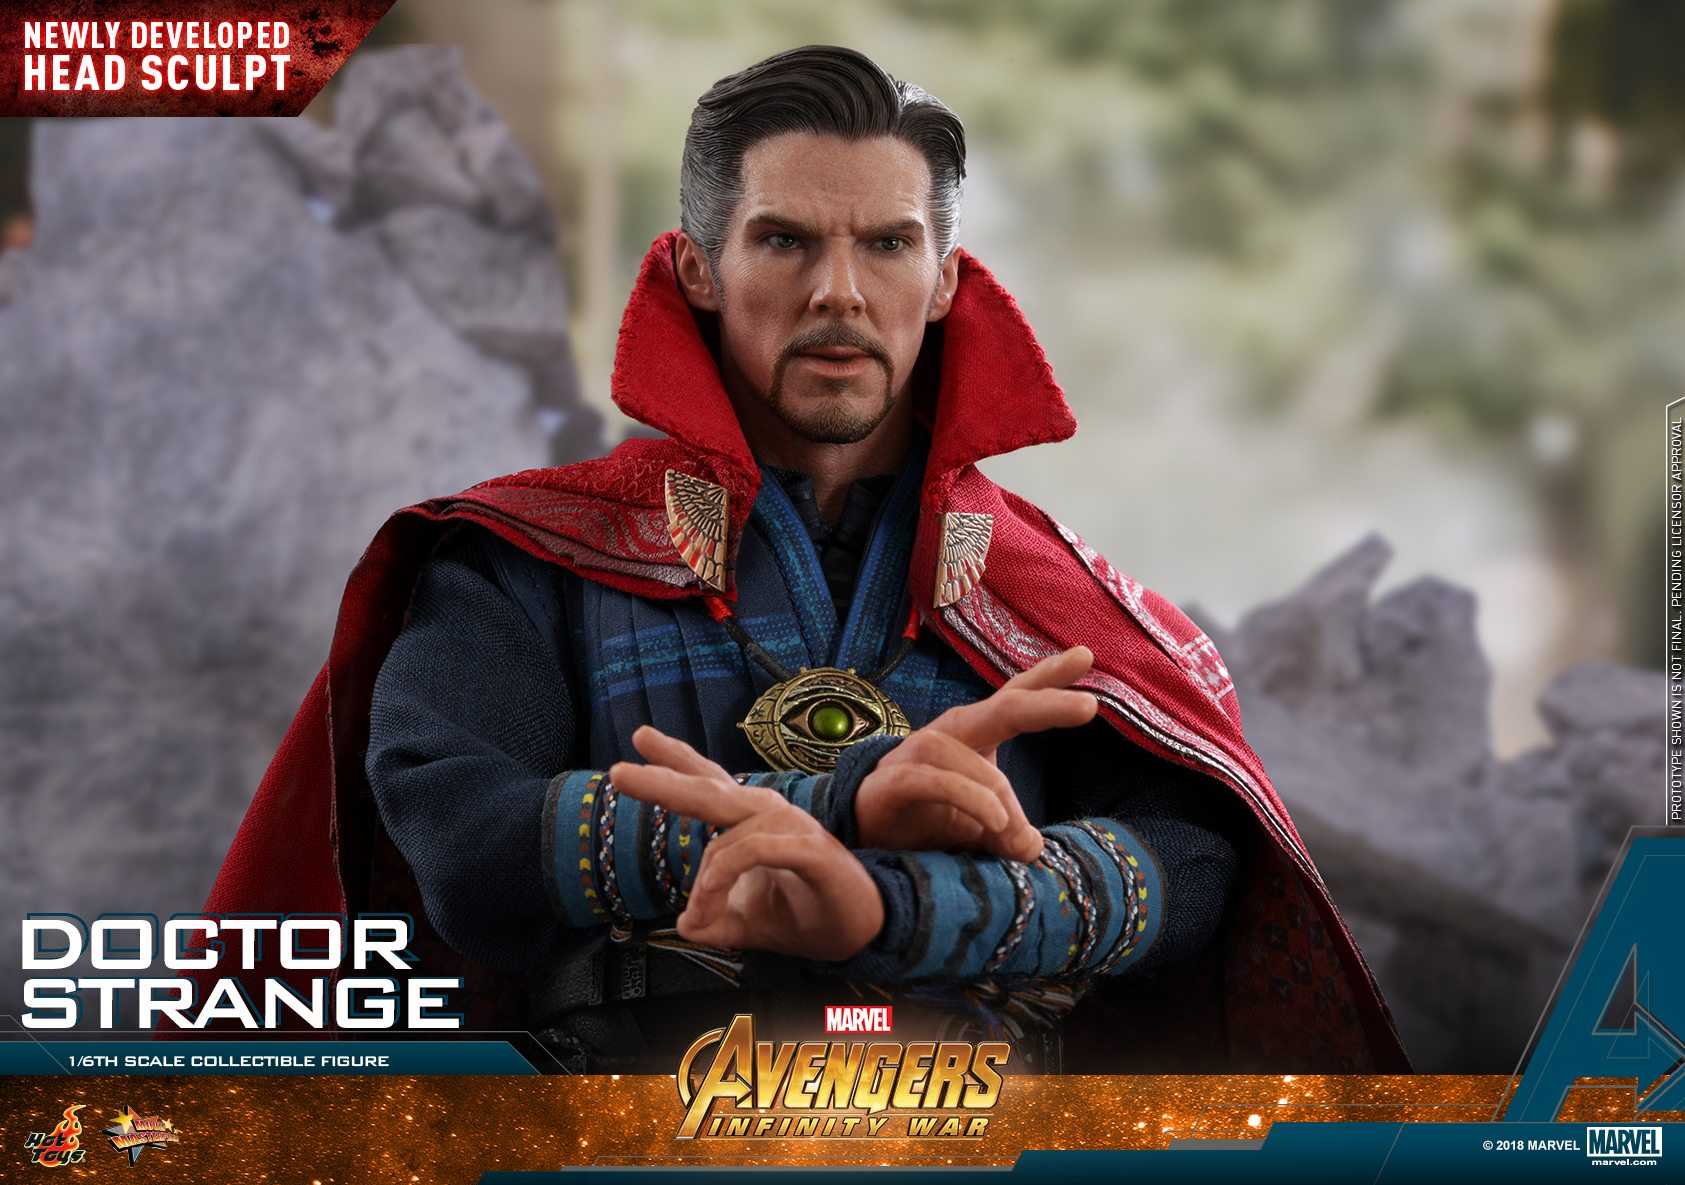 Doctor Strange obtiene una figura de Avengers: Infinity War Movie Masterpiece de Hot Toys